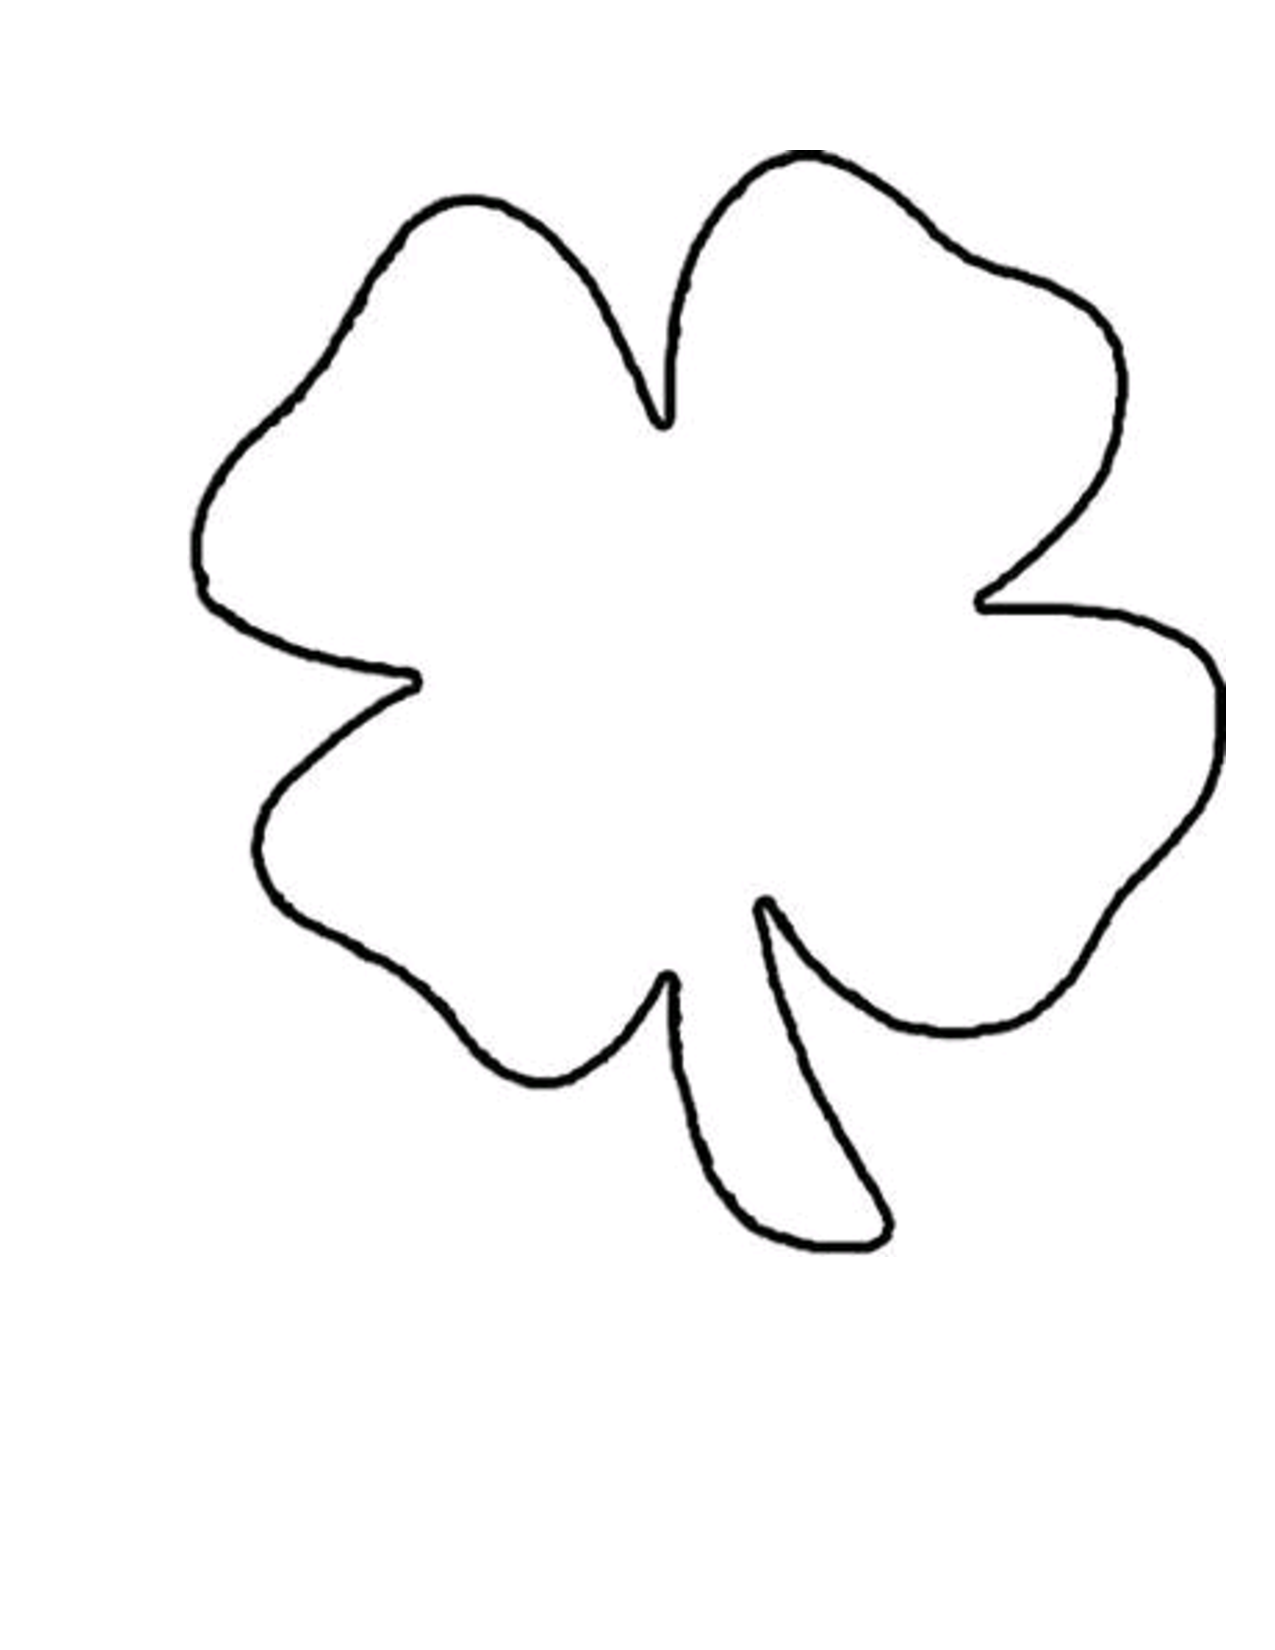 Printable coloring pages shamrock - Shamrock Templates Printable Shamrock Template